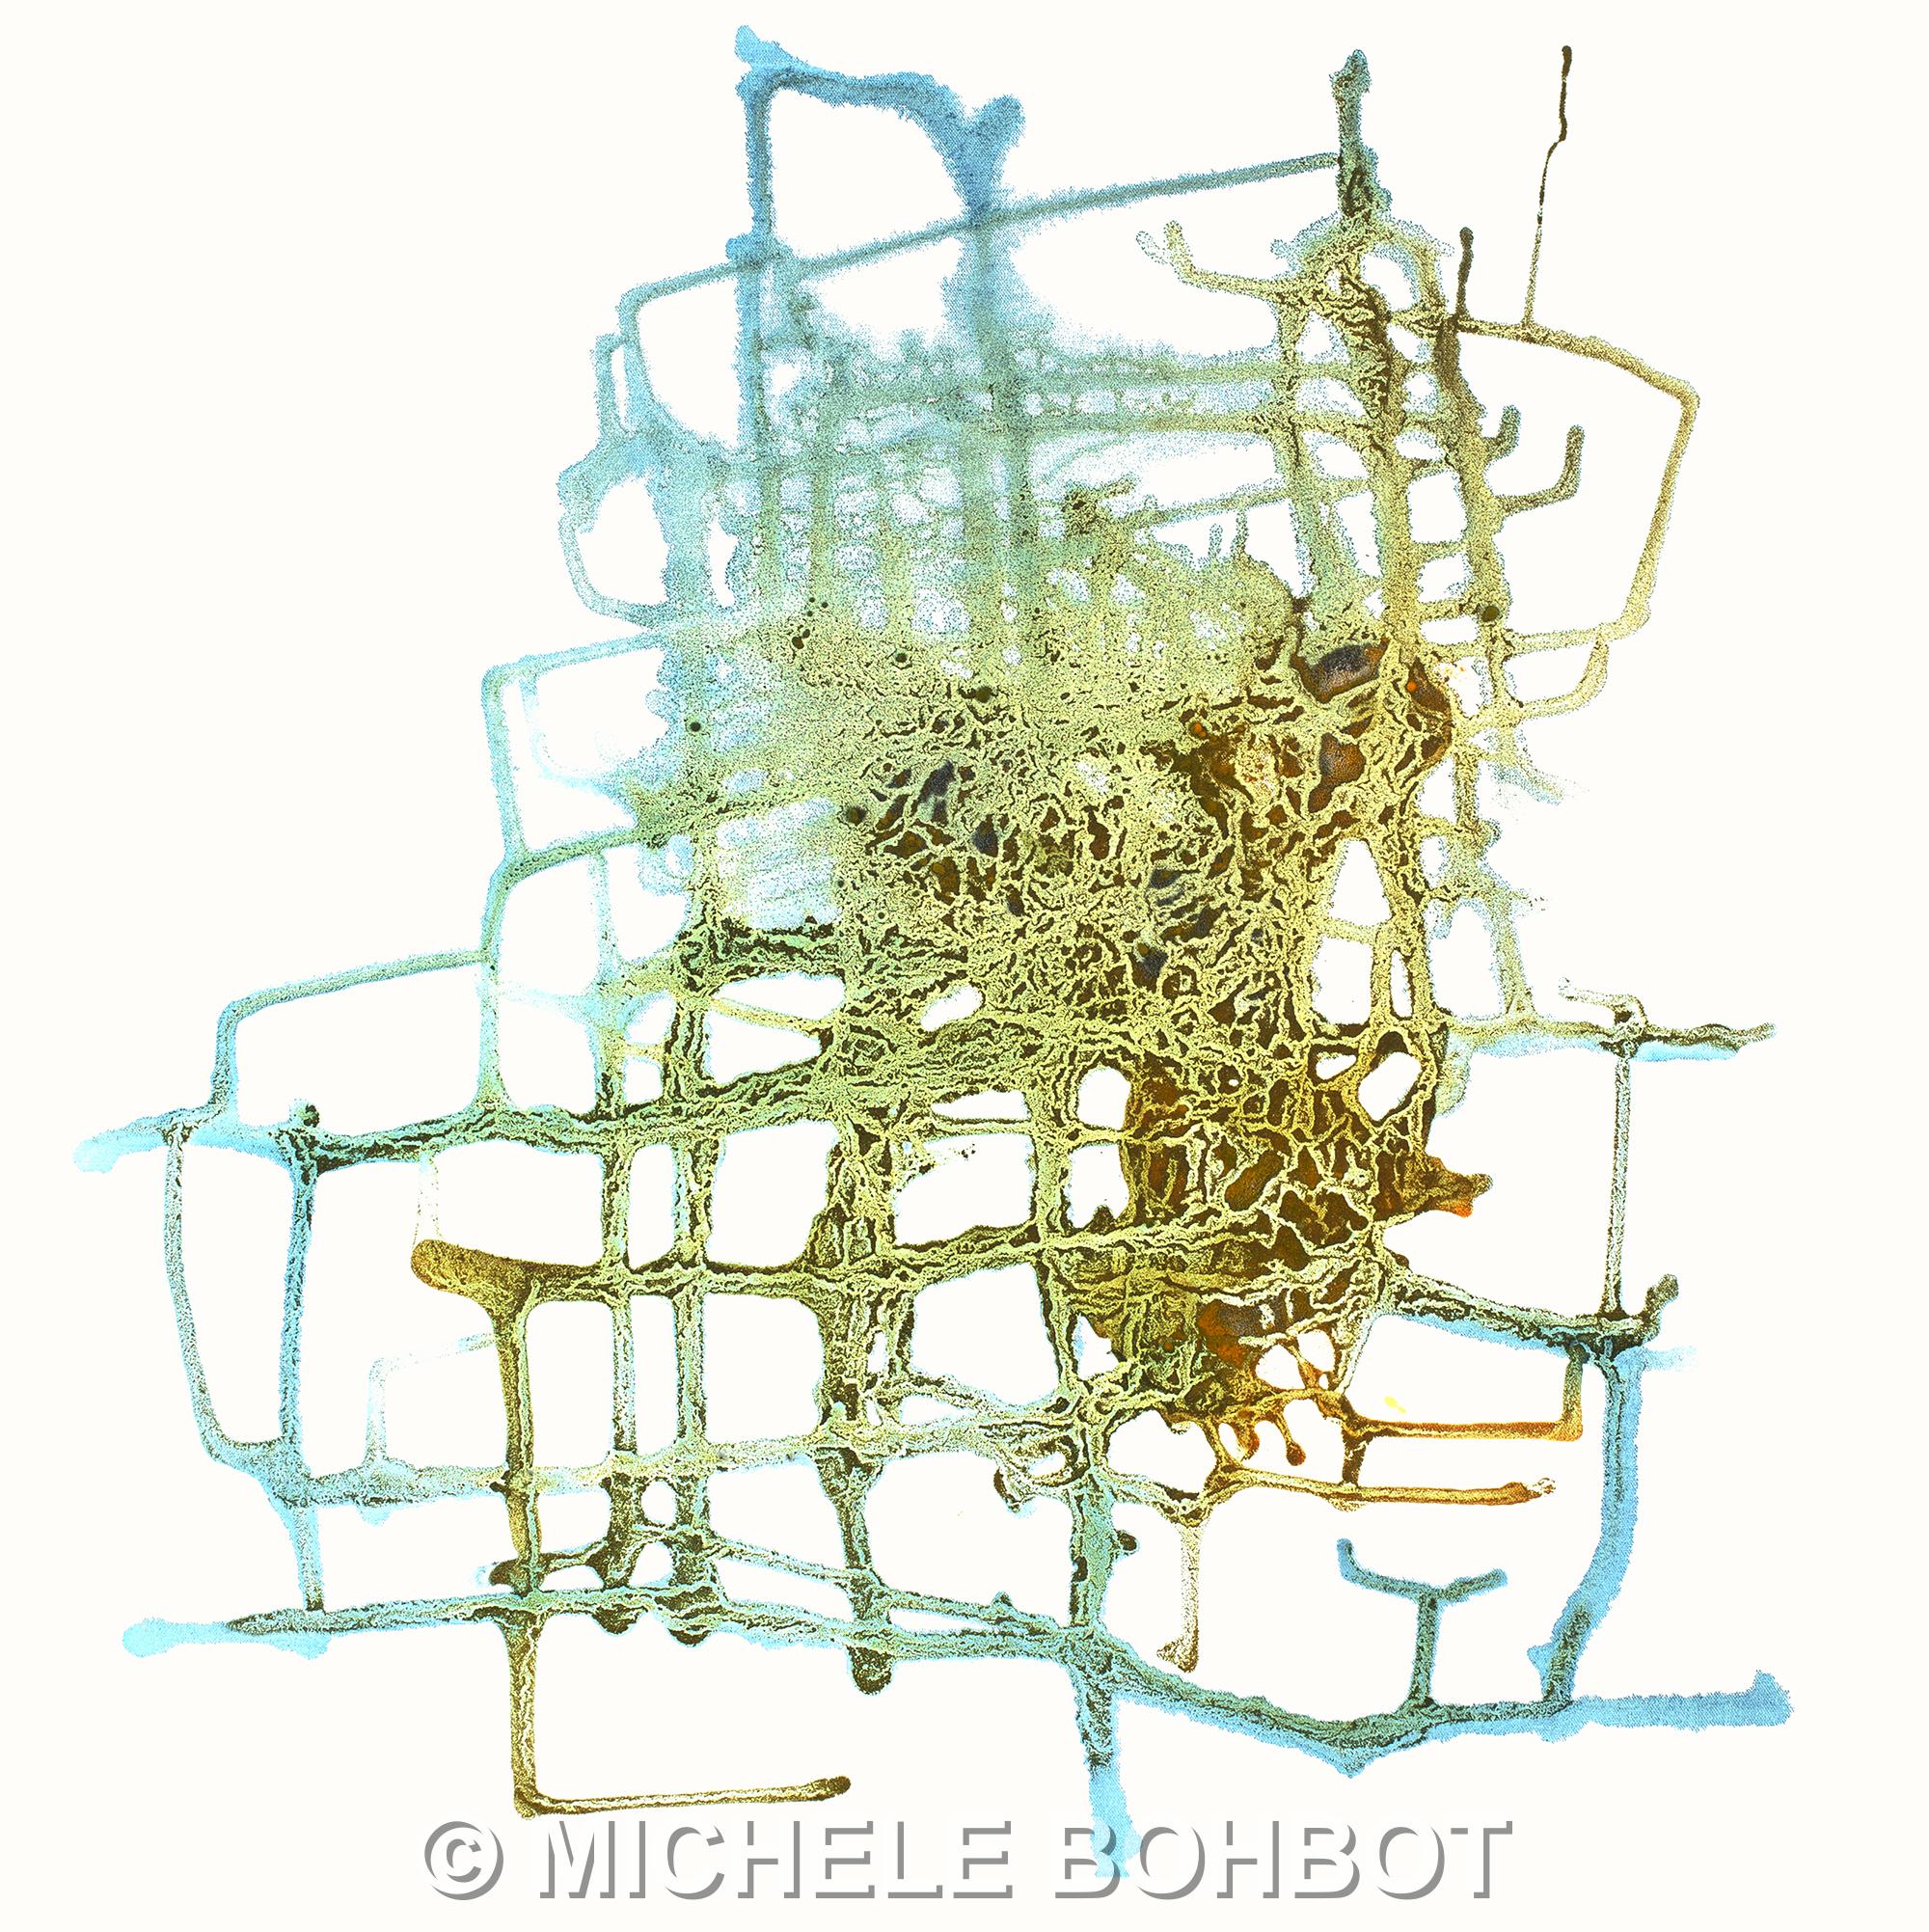 Michele A. Bohbot (4-13-19)_11_lg-1 copy.jpg